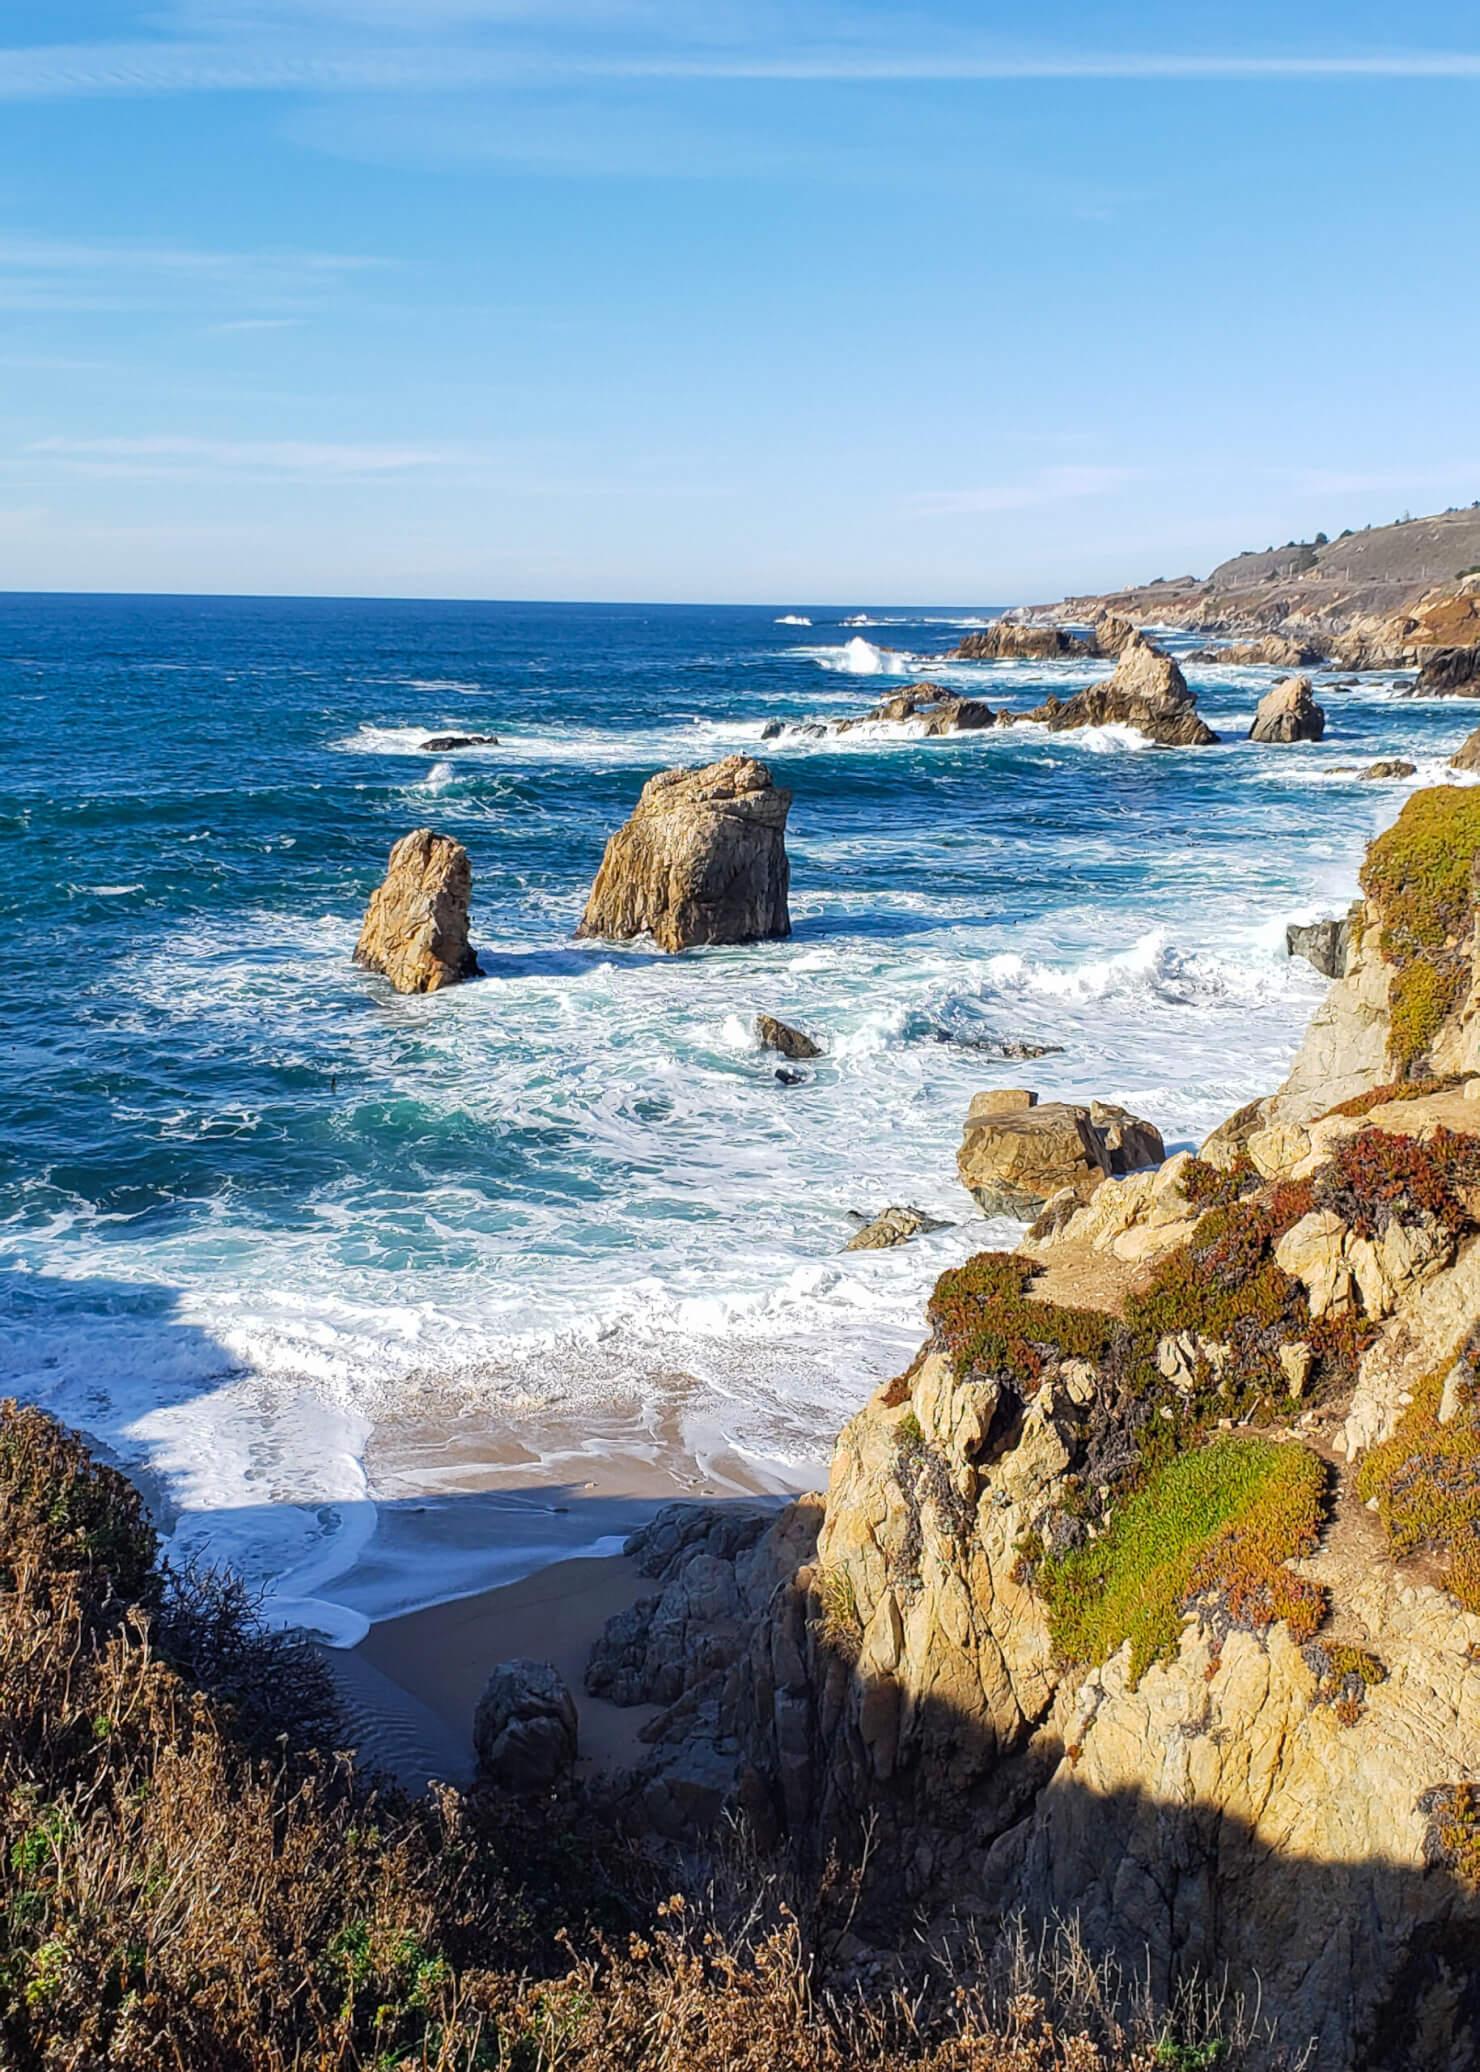 Pacific Ocean along HWY 1 south of Carmel CA